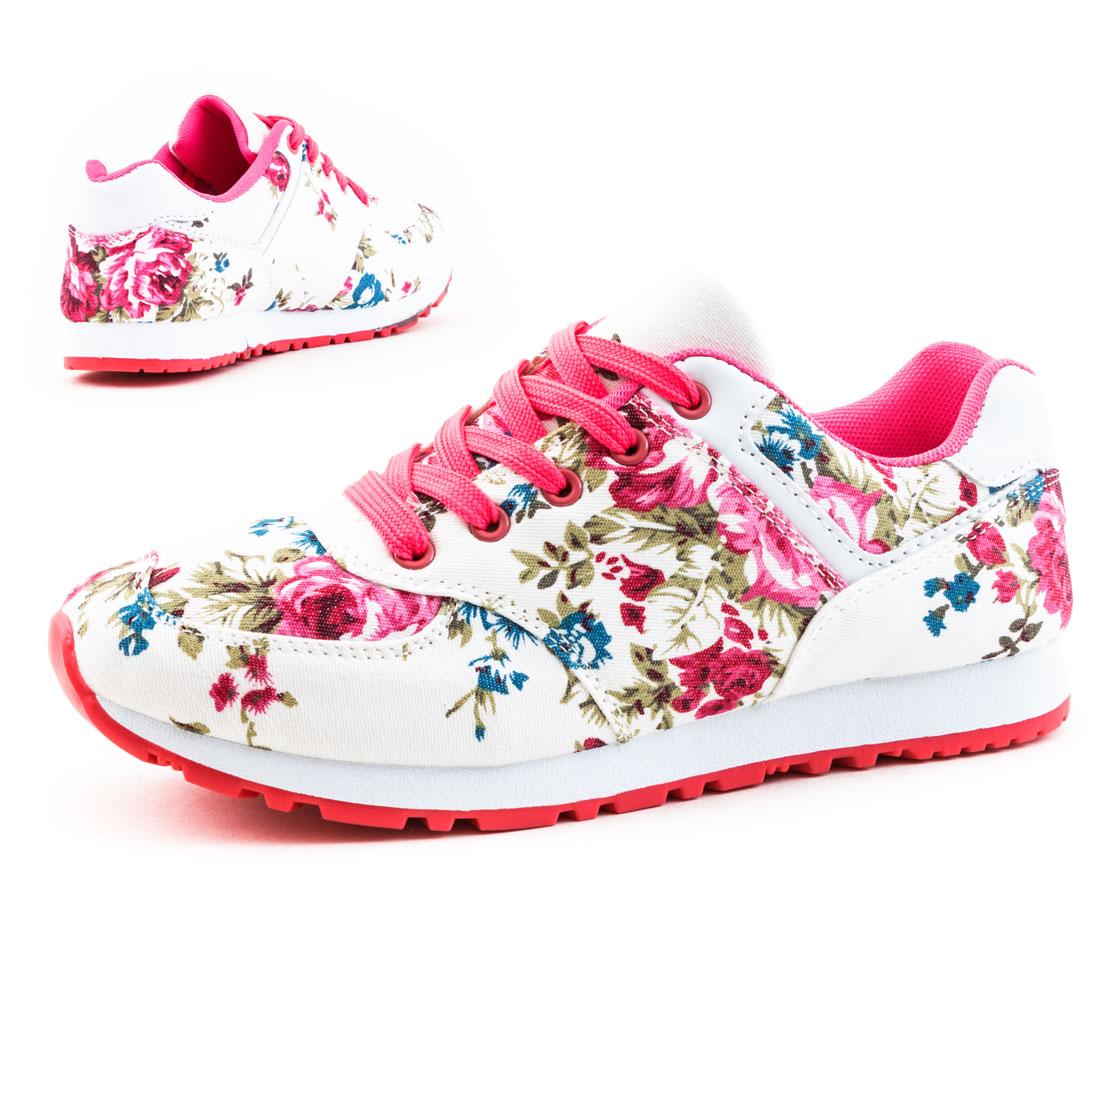 Blumen De Ppyhwgwwq Nike Damen Navosch Mit Schuhe Yy7fbg6